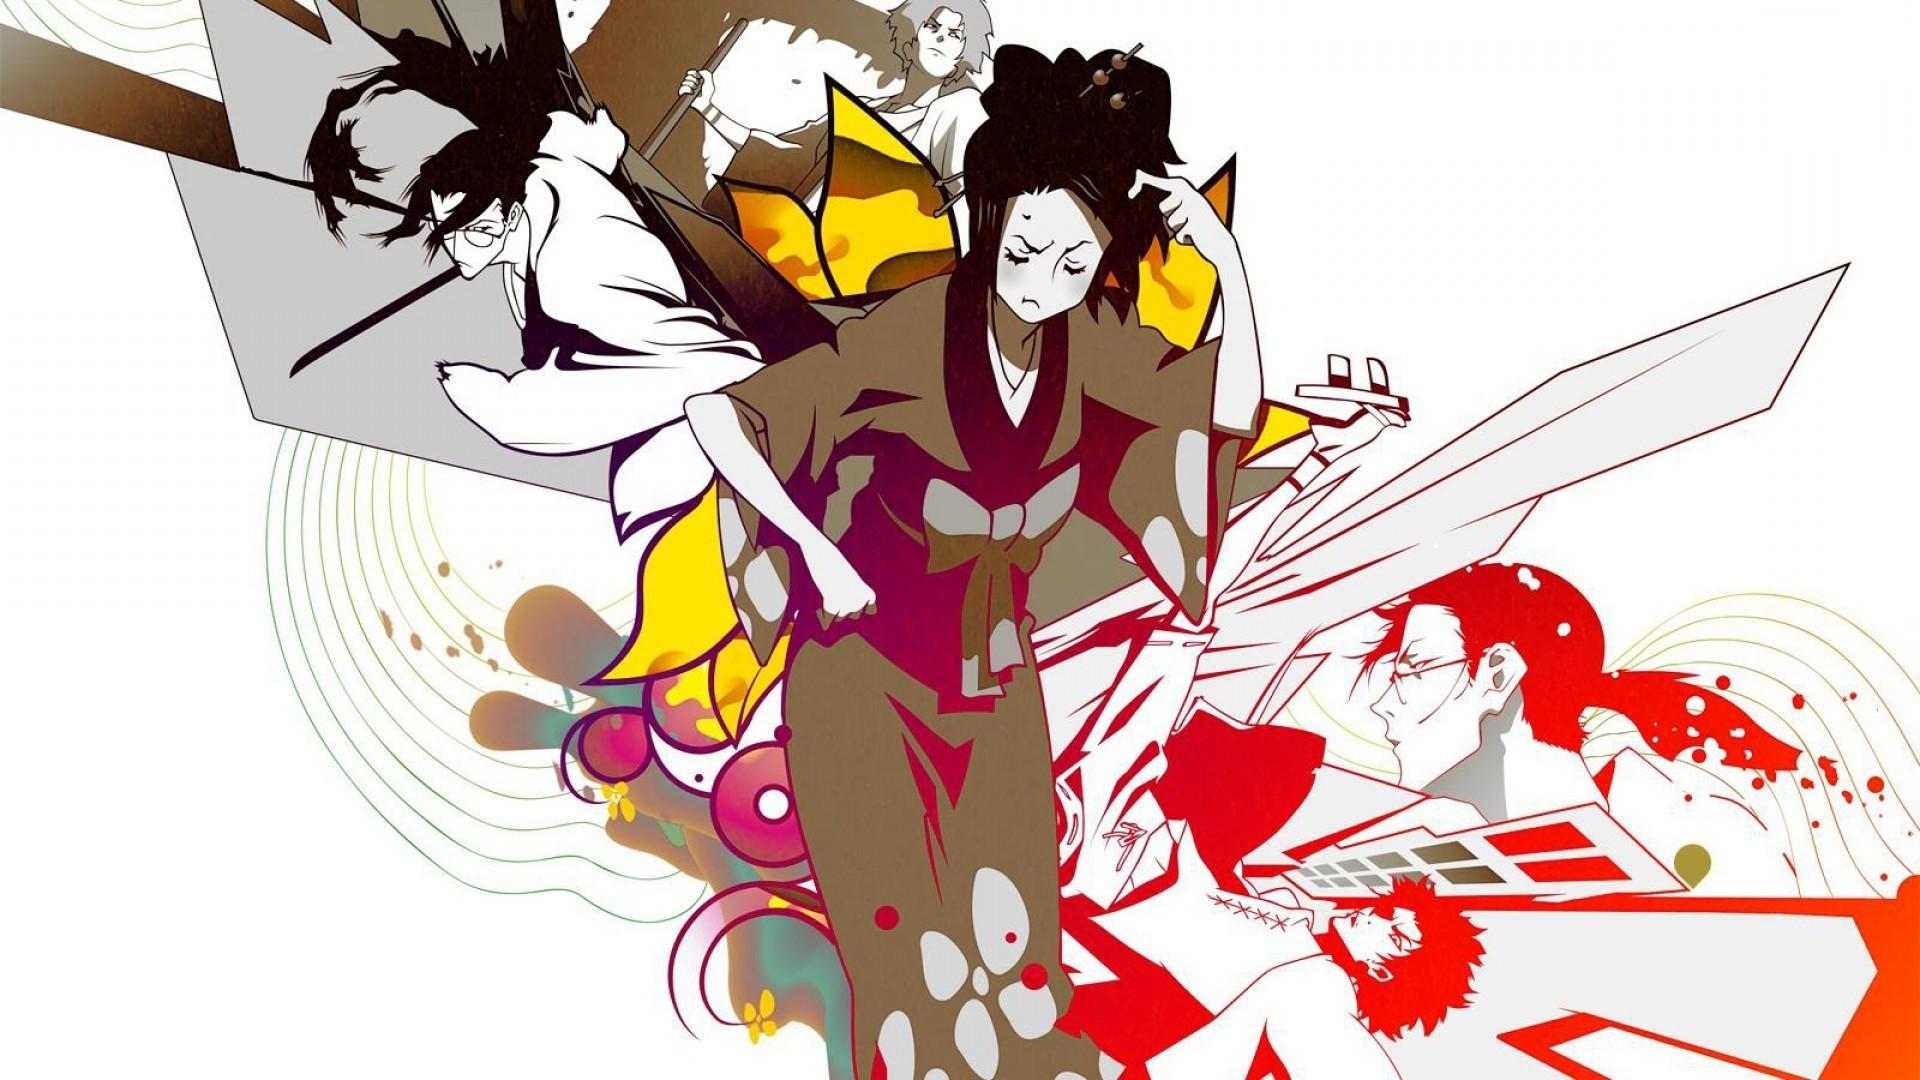 Res: 1920x1080, anime, Samurai Champloo, Fuu, Mugen, Jin (Samurai Champloo) Wallpapers HD /  Desktop and Mobile Backgrounds